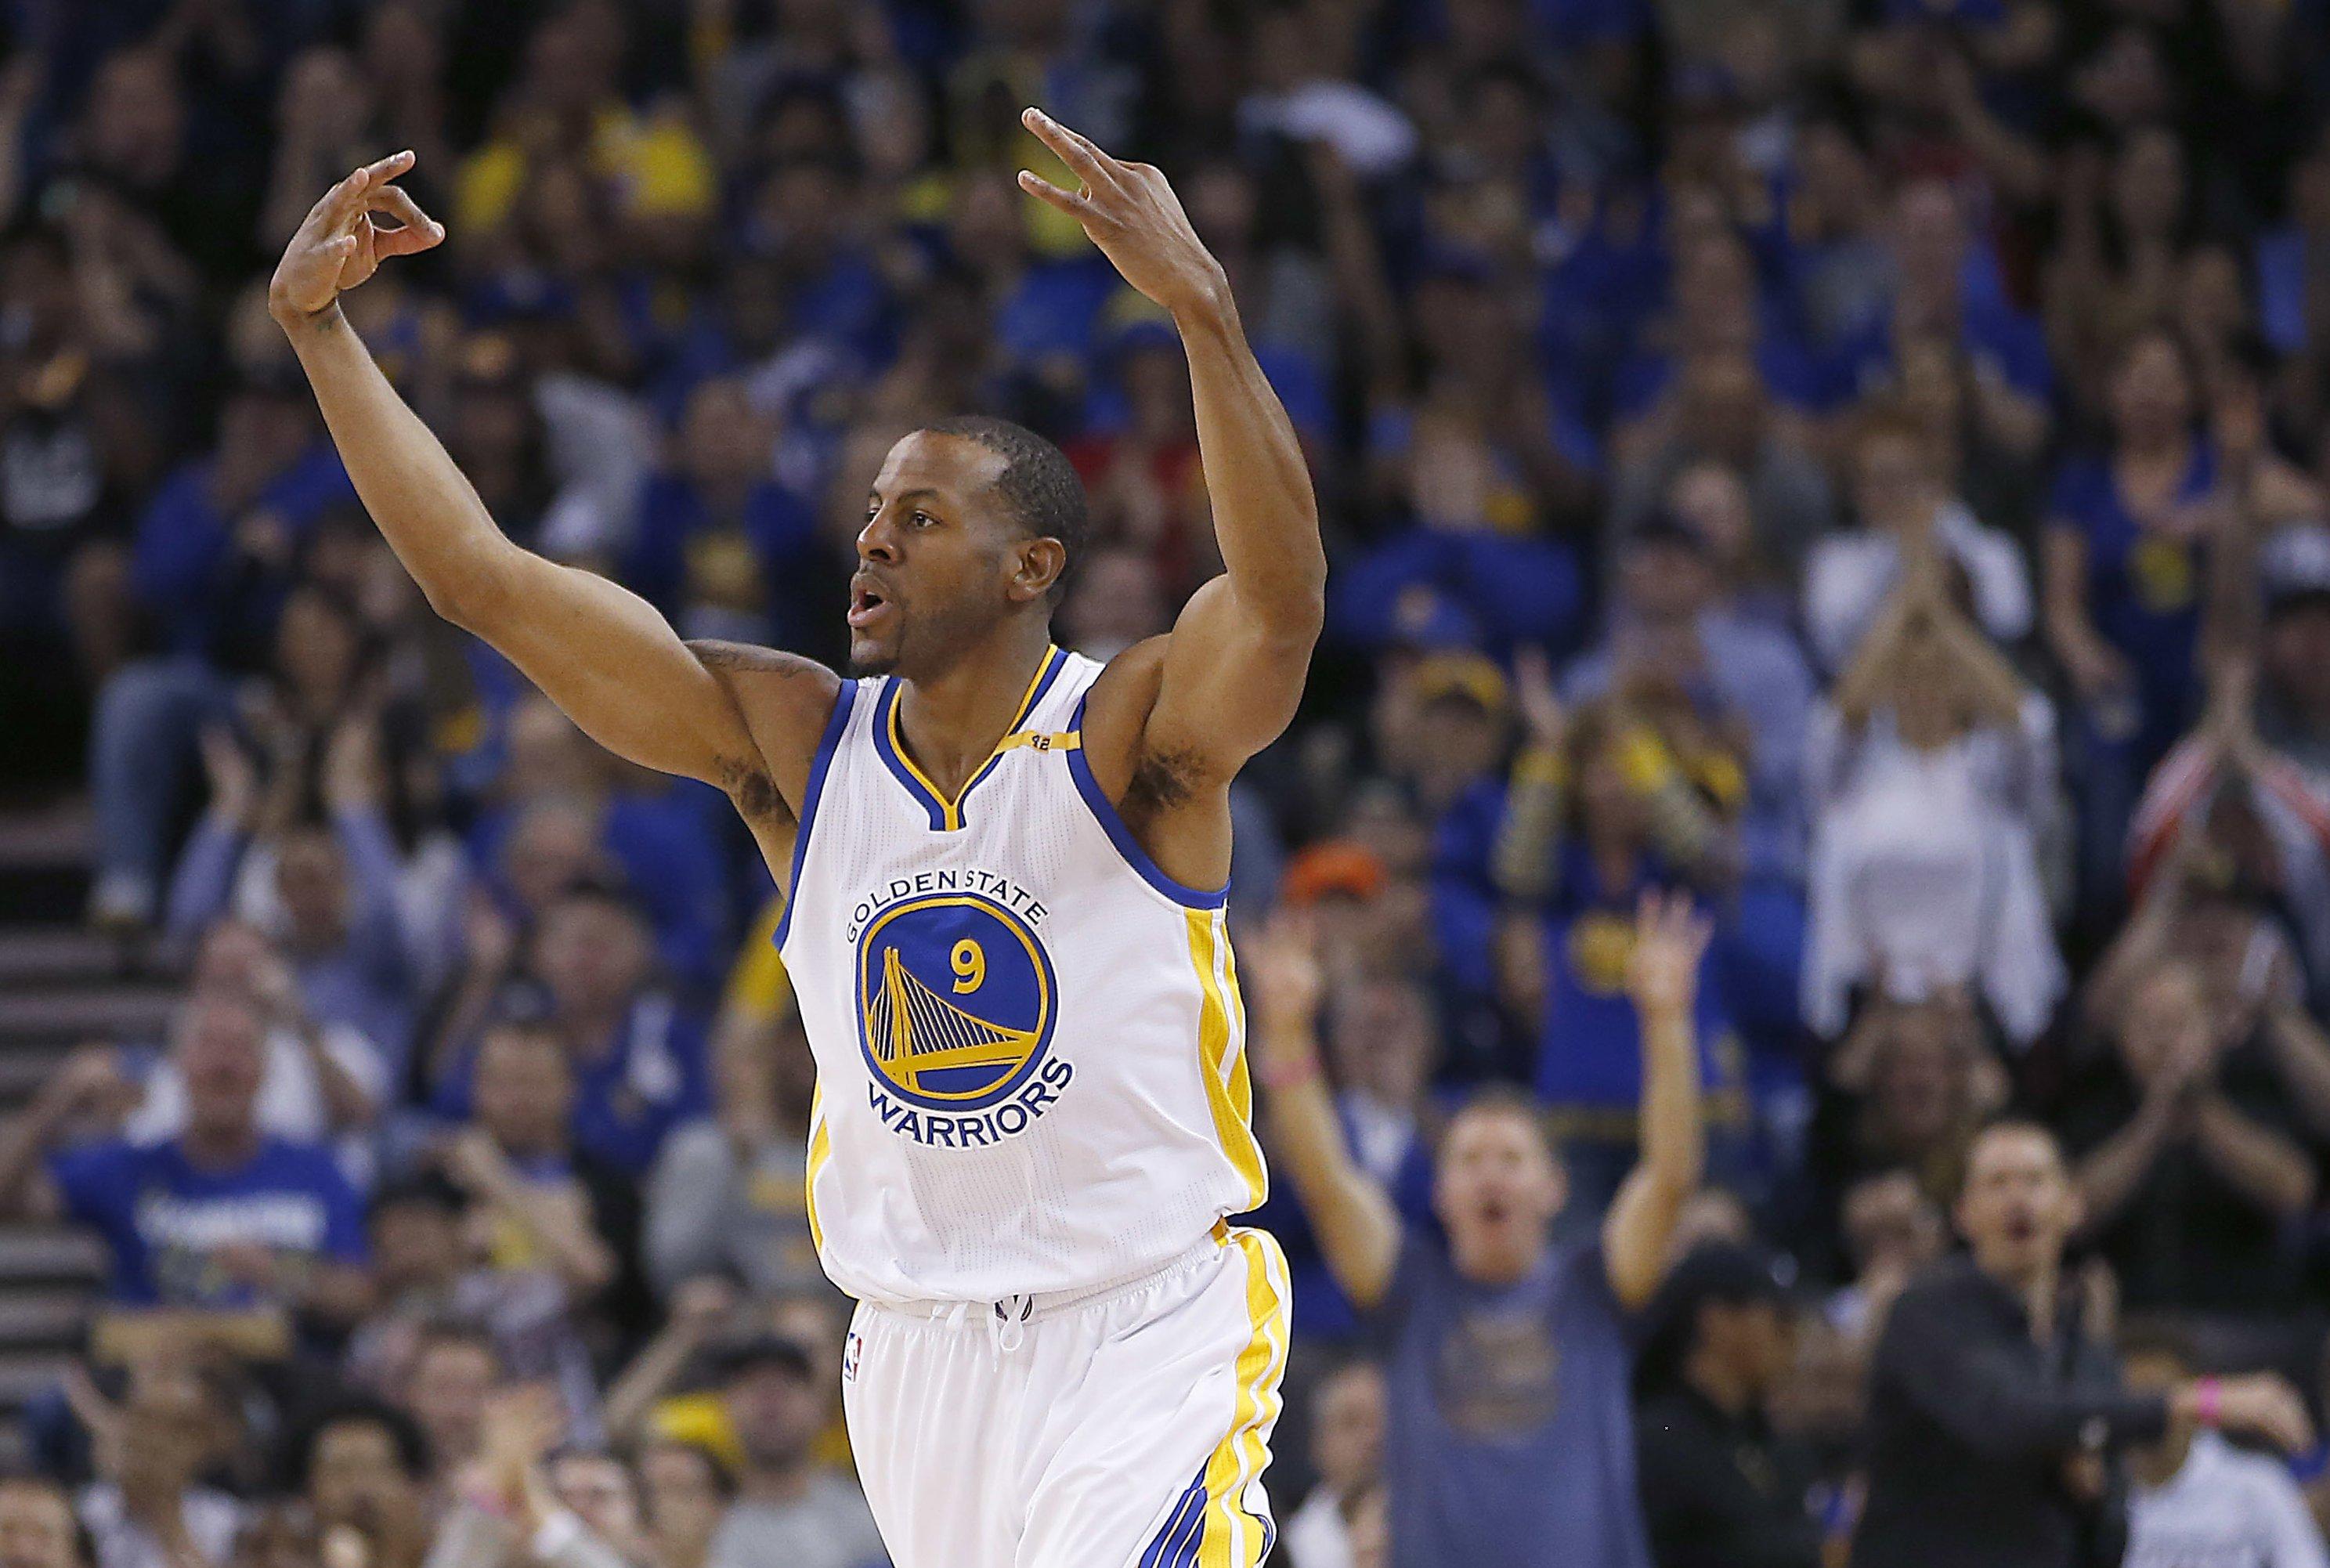 Ranking the Top 10 NBA Small Forwards Entering 2017-18